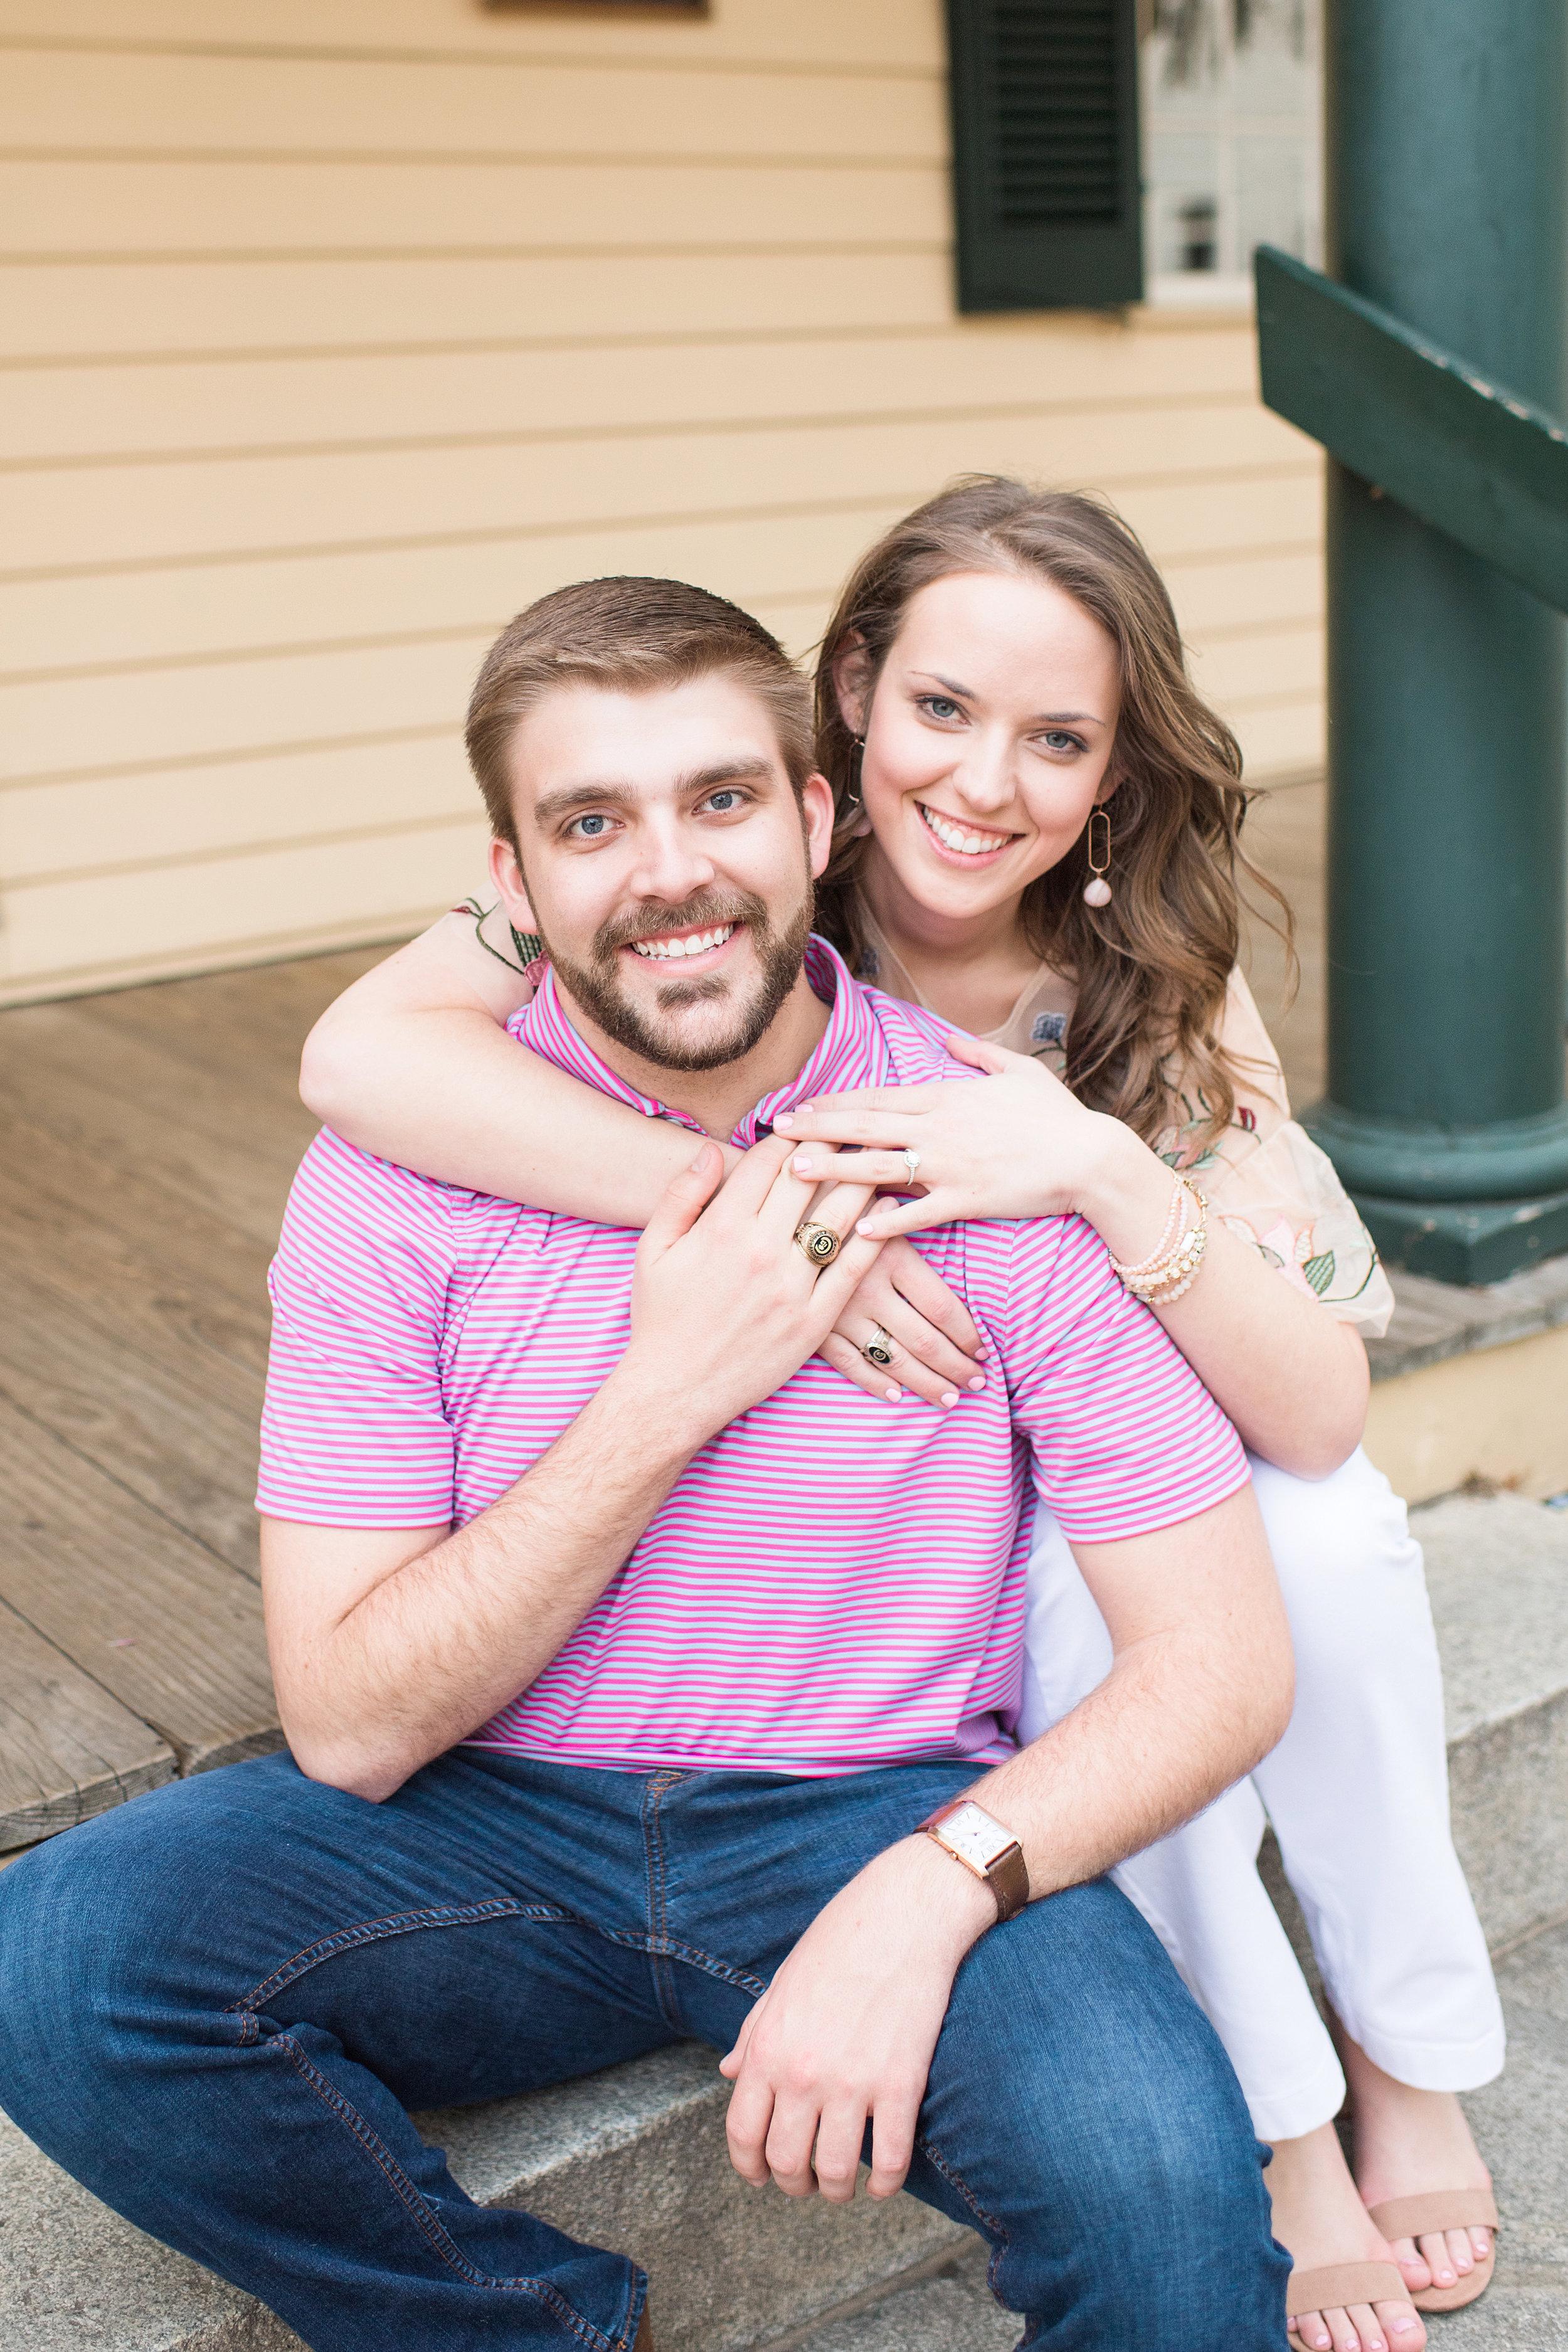 Anna McAlister & Tyler Leaphart - Wedding on March 30, 2019